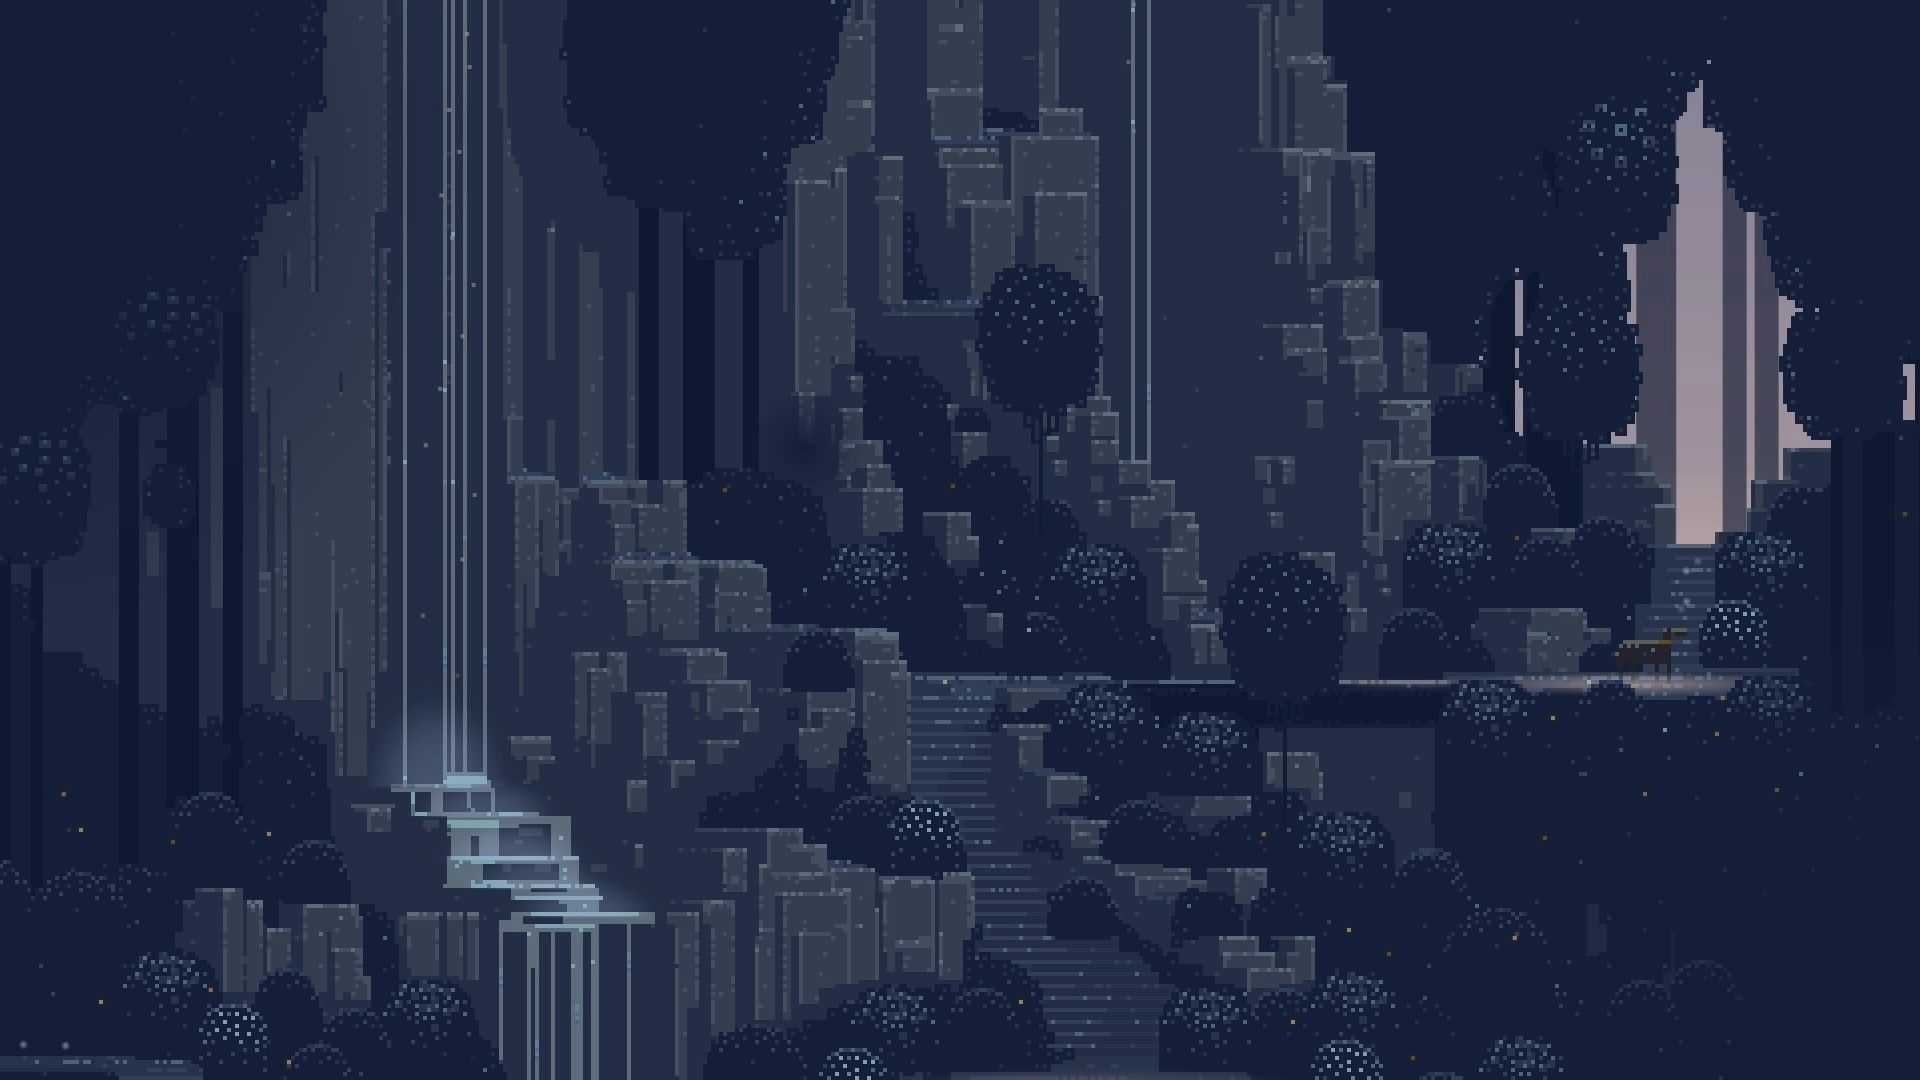 Waterfall (Pixel art) [19201080] | wallpapers | Pinterest | Wallpaper, Pixel art background and ...